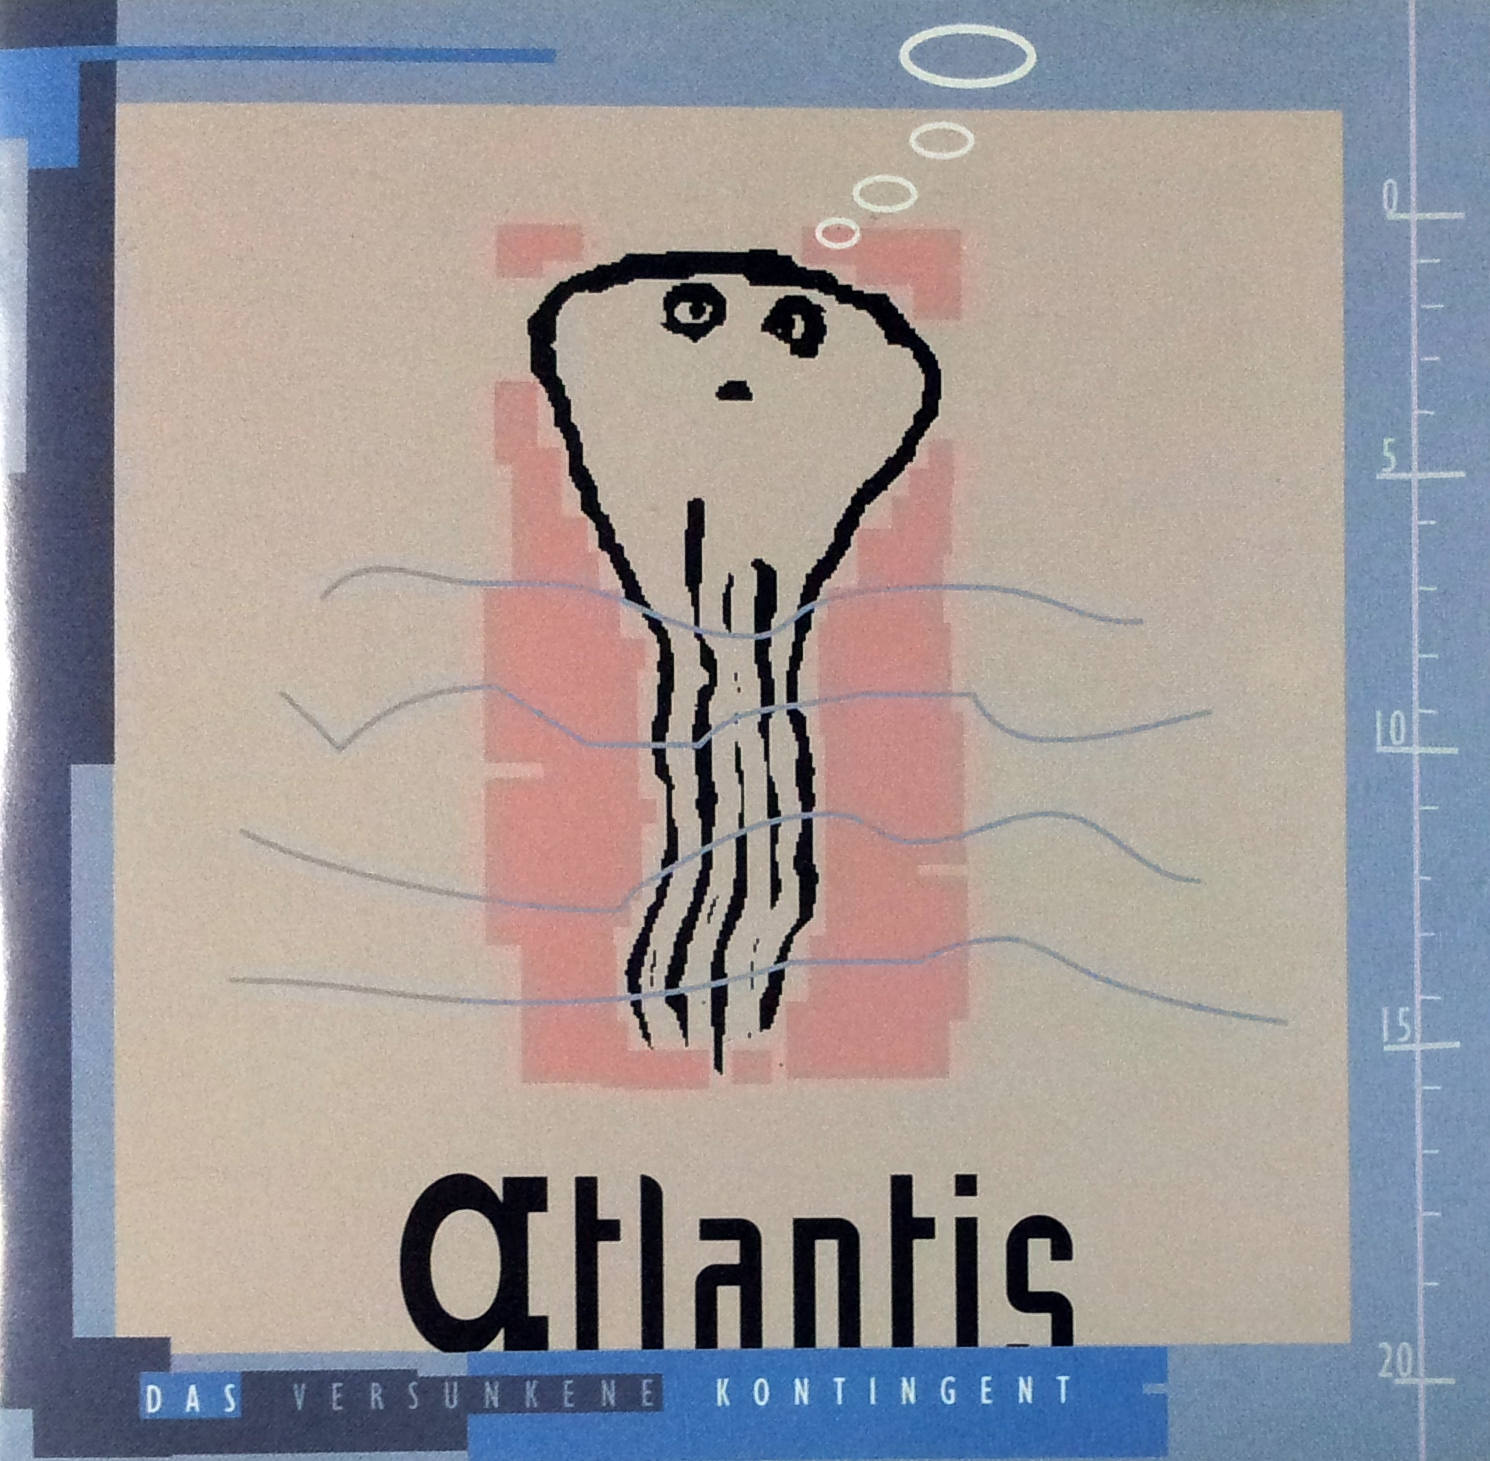 Atlantis - Das versunkene Kontingent